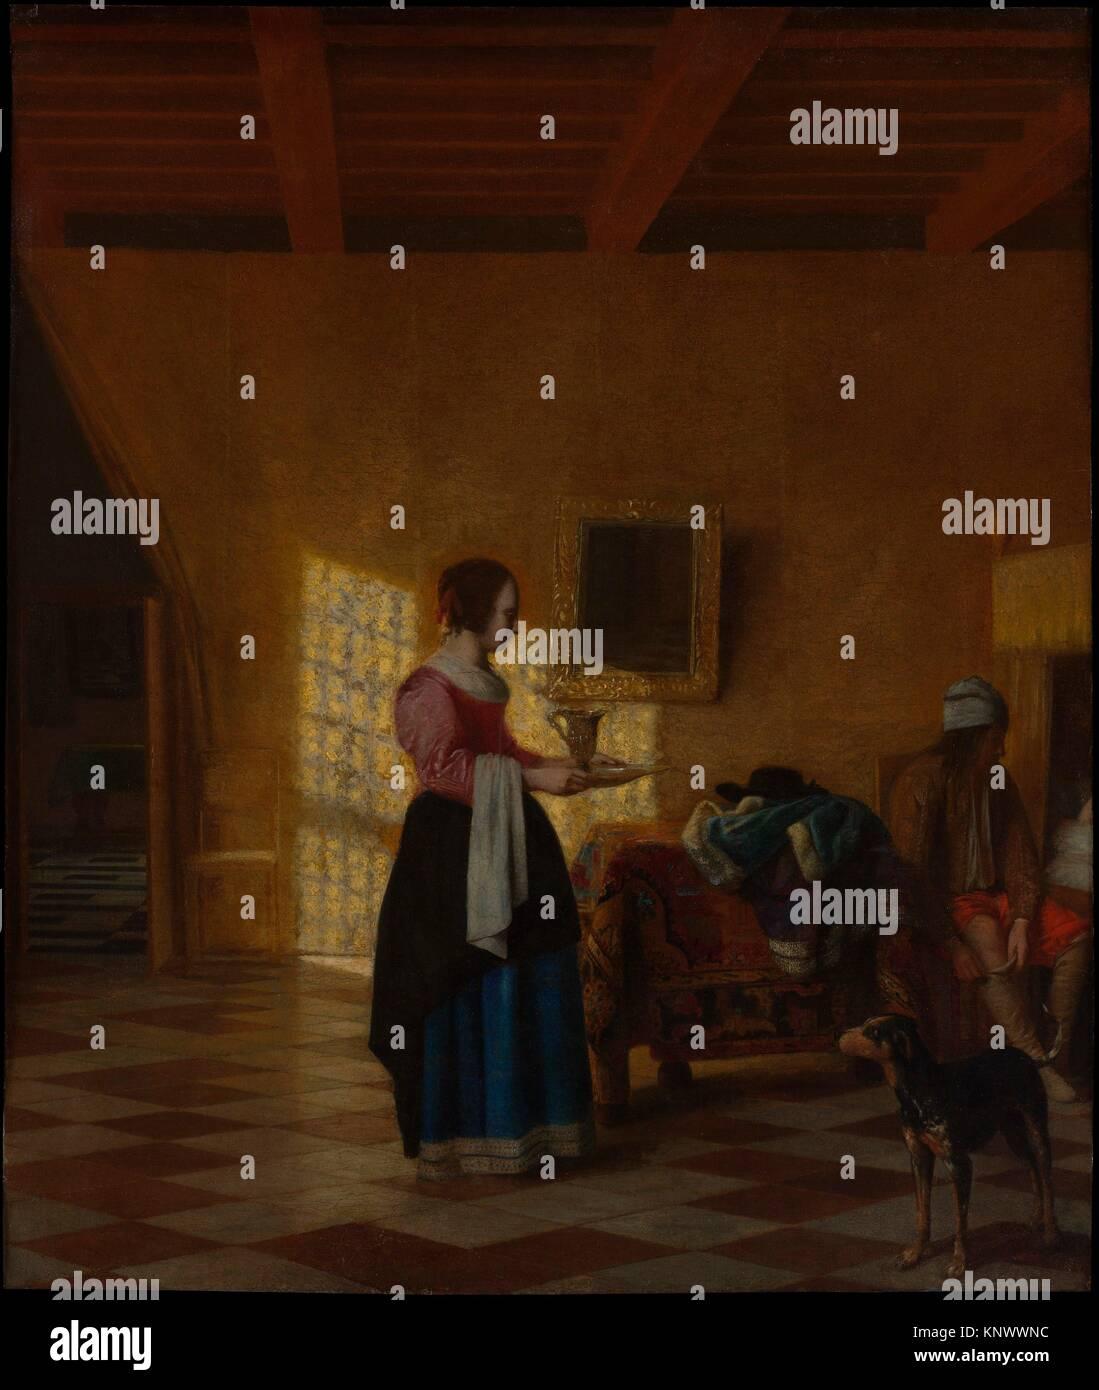 Donna cerca uomo a amsterdam [PUNIQRANDLINE-(au-dating-names.txt) 60